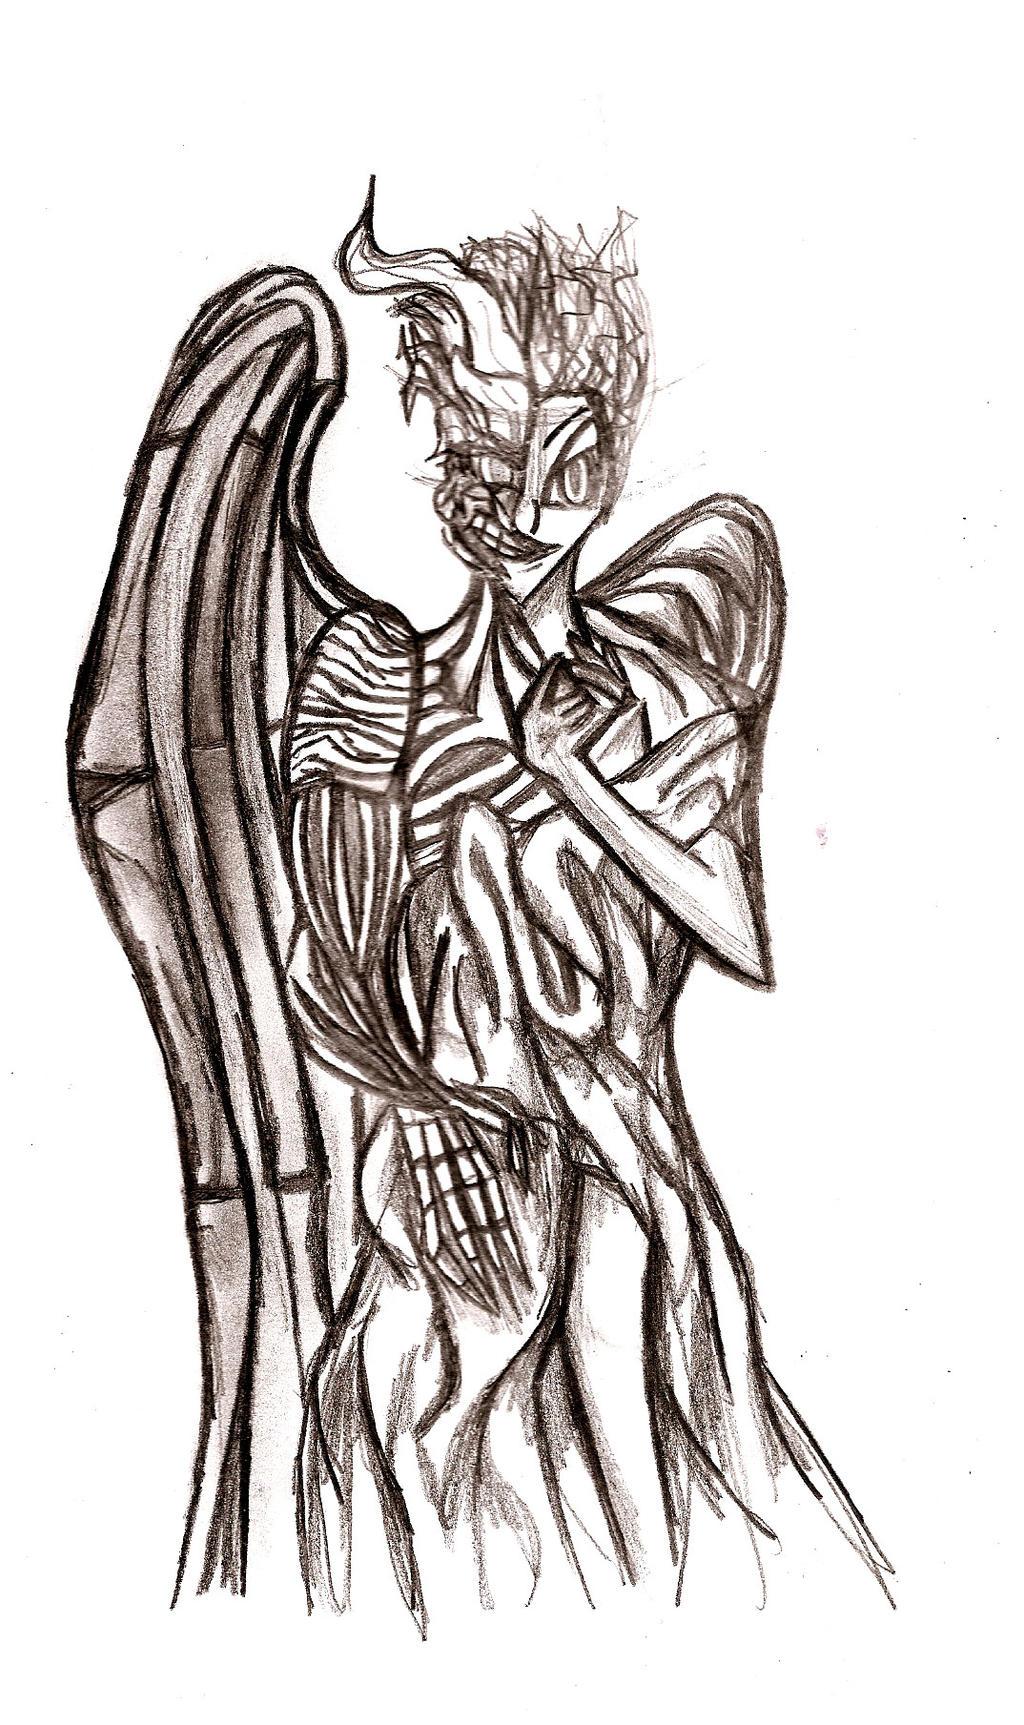 angel and demons drawings - photo #9